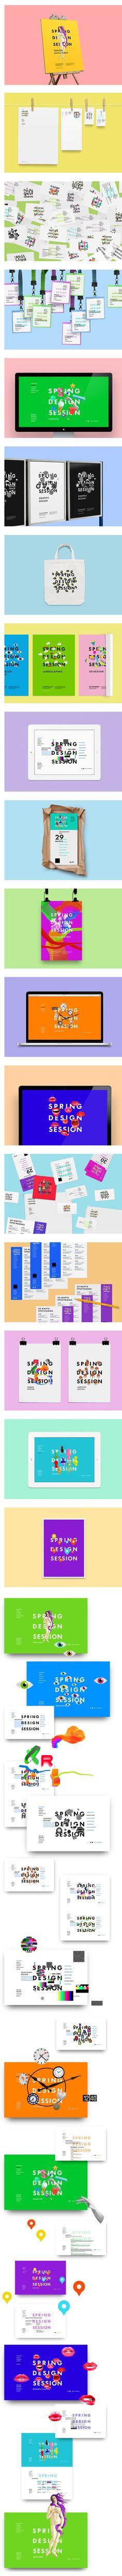 SPRING DESIGN SESSION by Vova Lifanov, via Behance